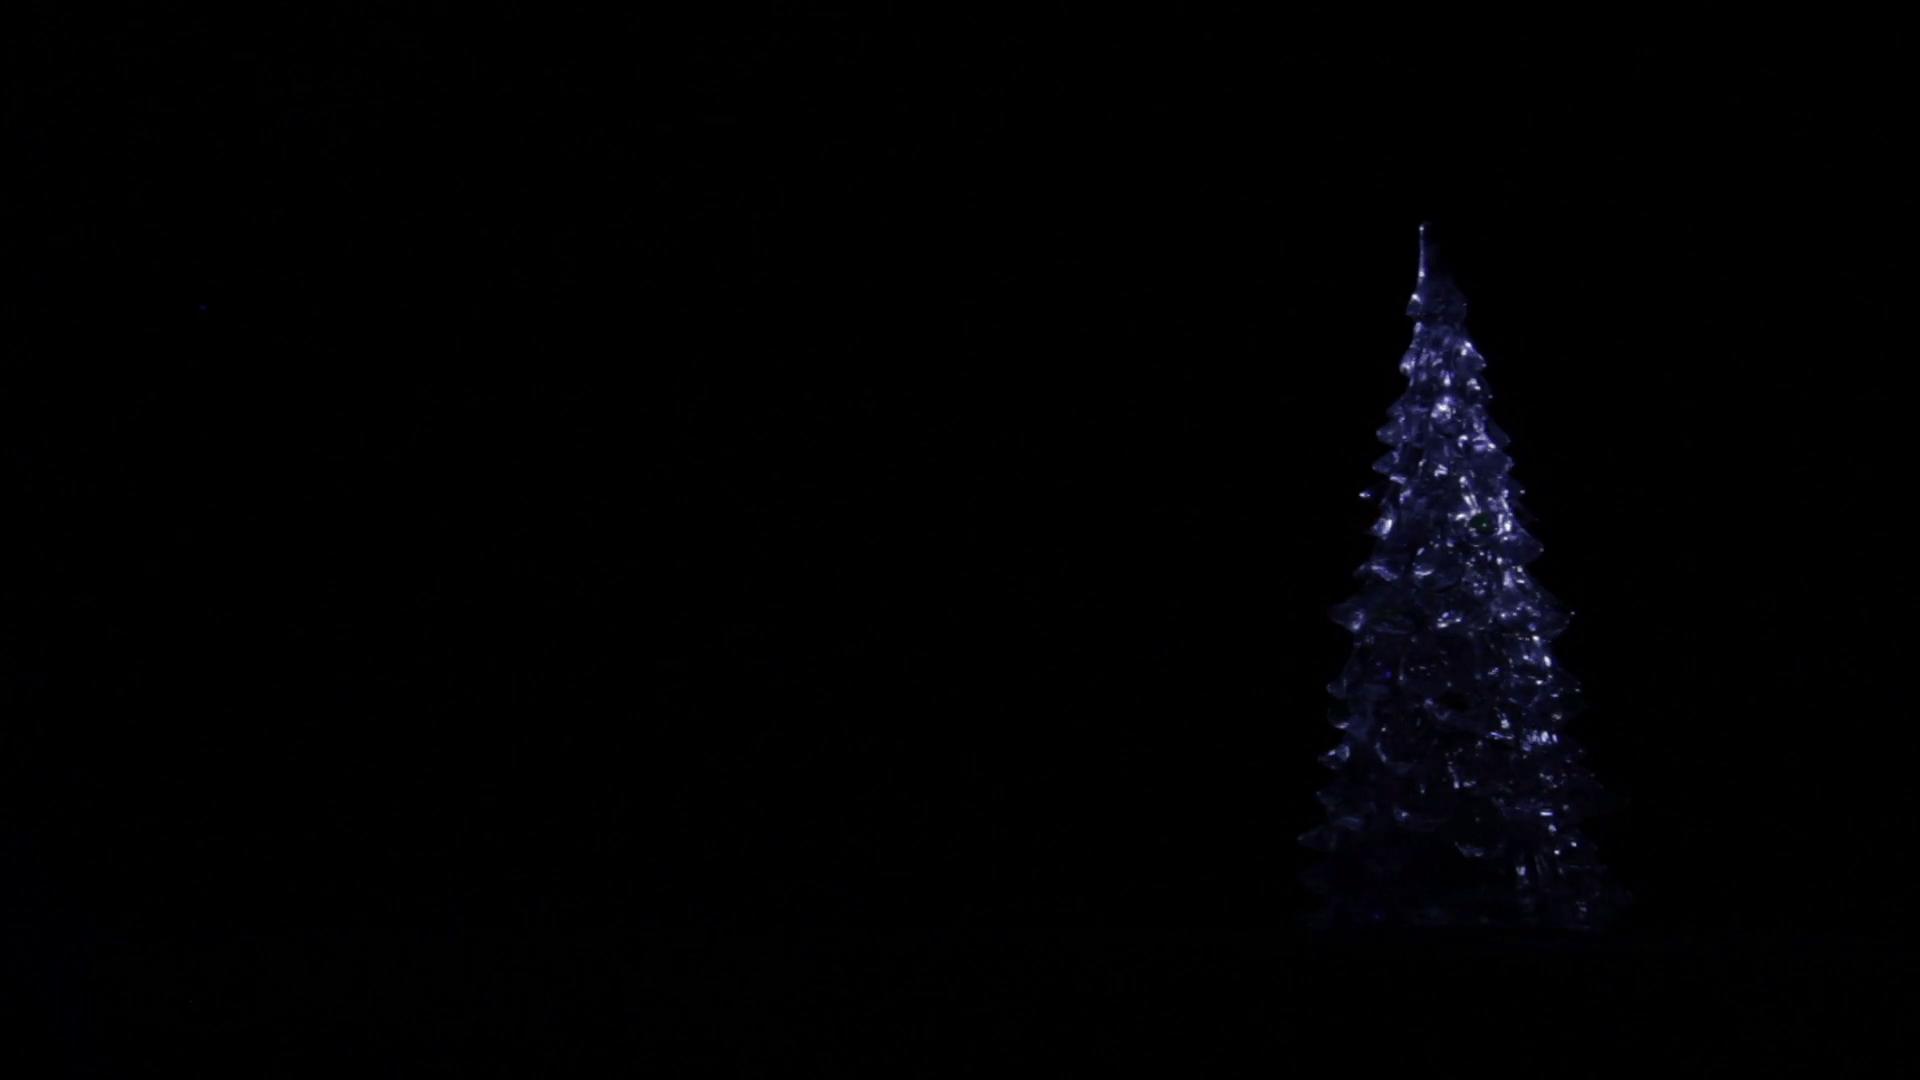 Dark Christmas Wallpapers Top Free Dark Christmas Backgrounds Wallpaperaccess